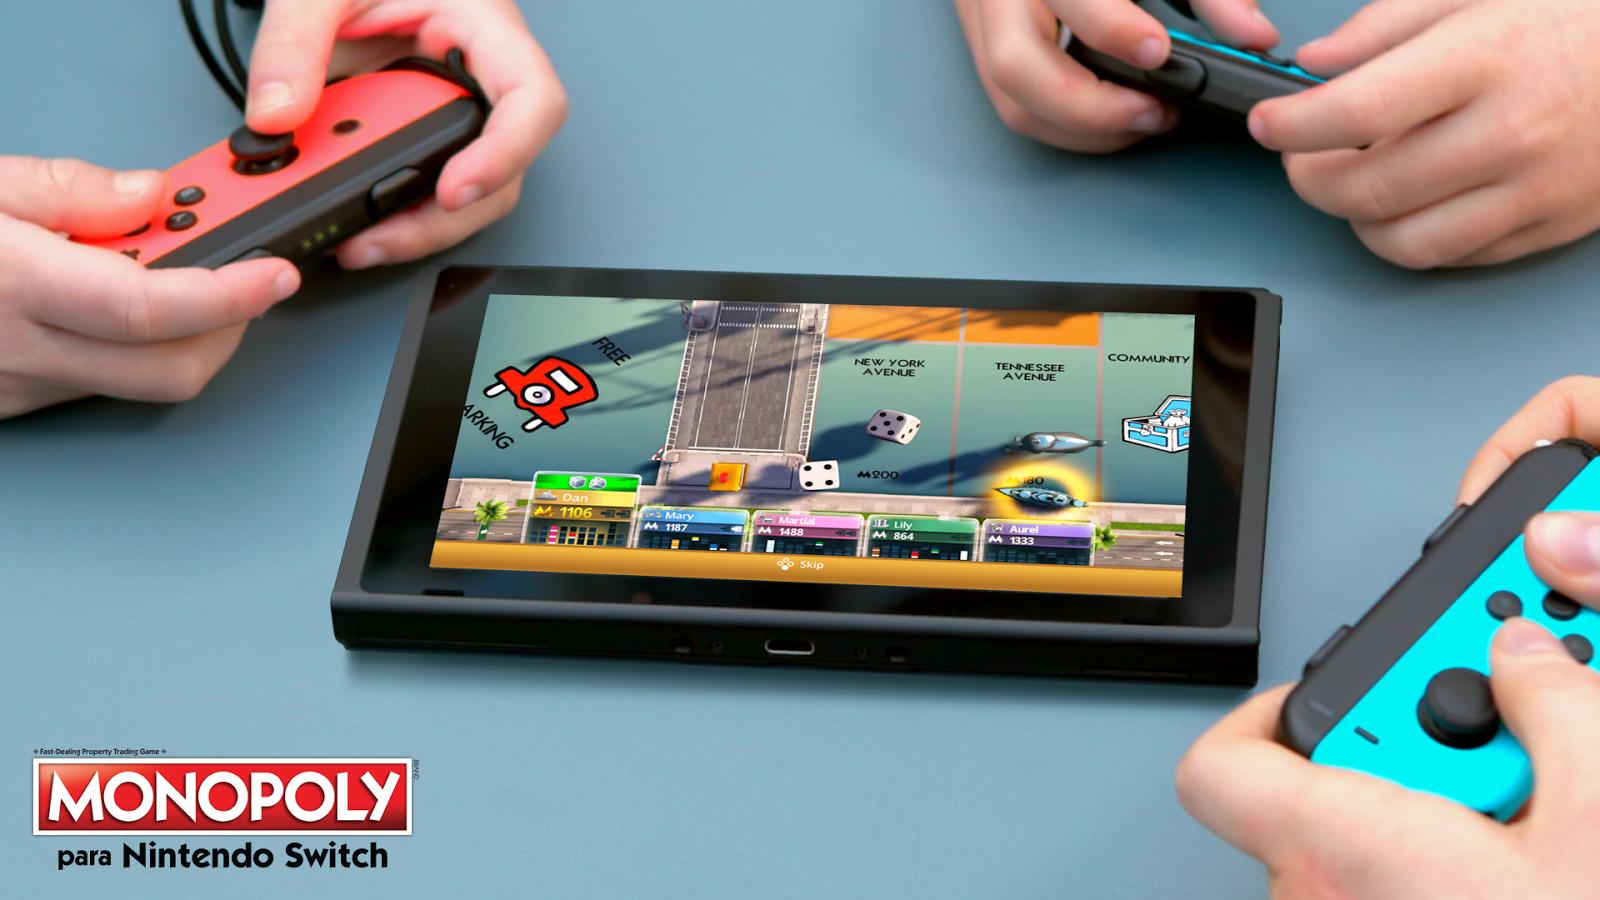 Monopoly ya disponible en Nintendo Switch